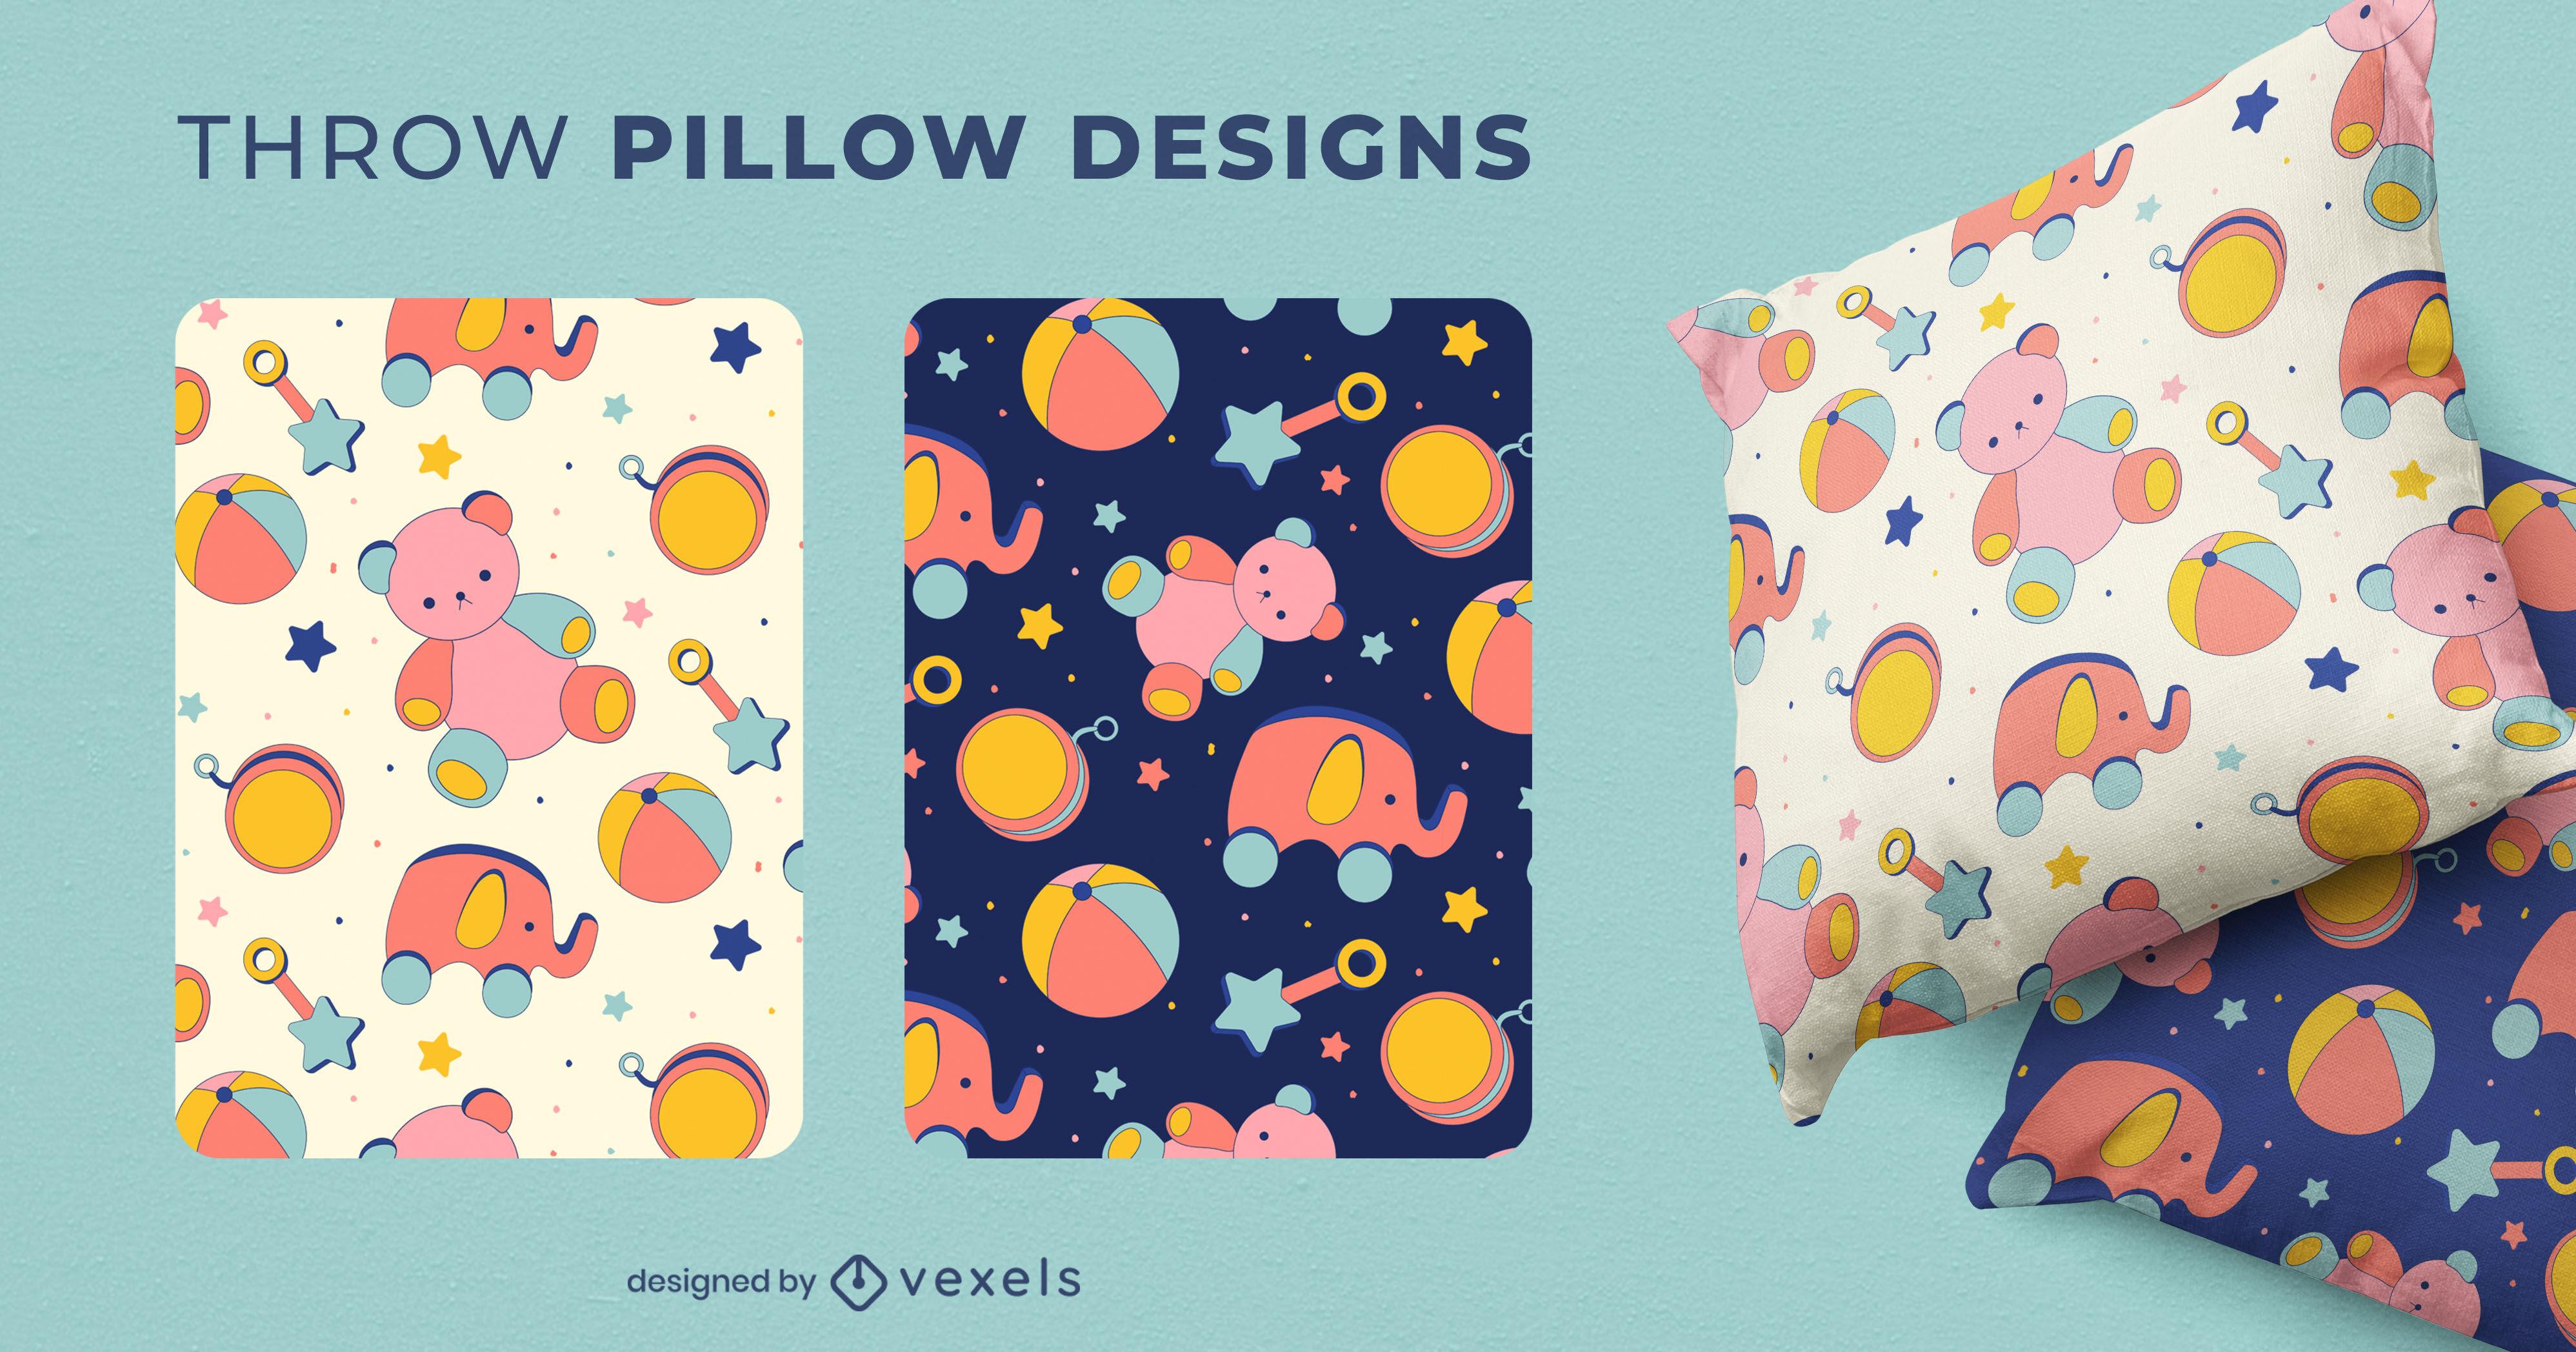 Diseño de almohada de tiro con patrón de juguetes para niños